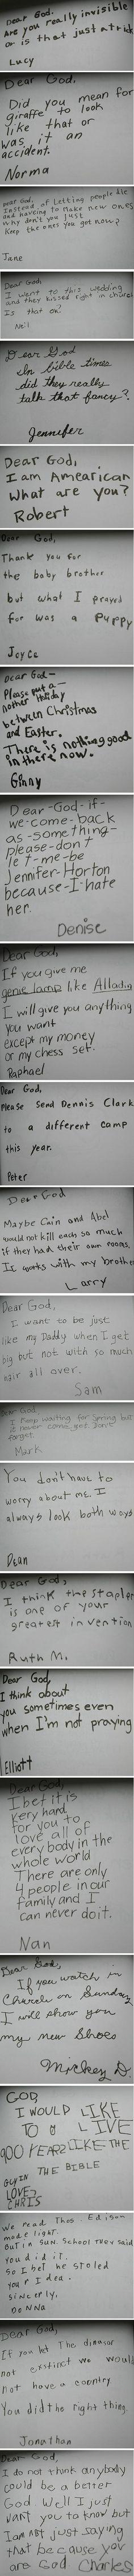 'Dear God, So who made the dinosaurs….?' | The Ketchup War